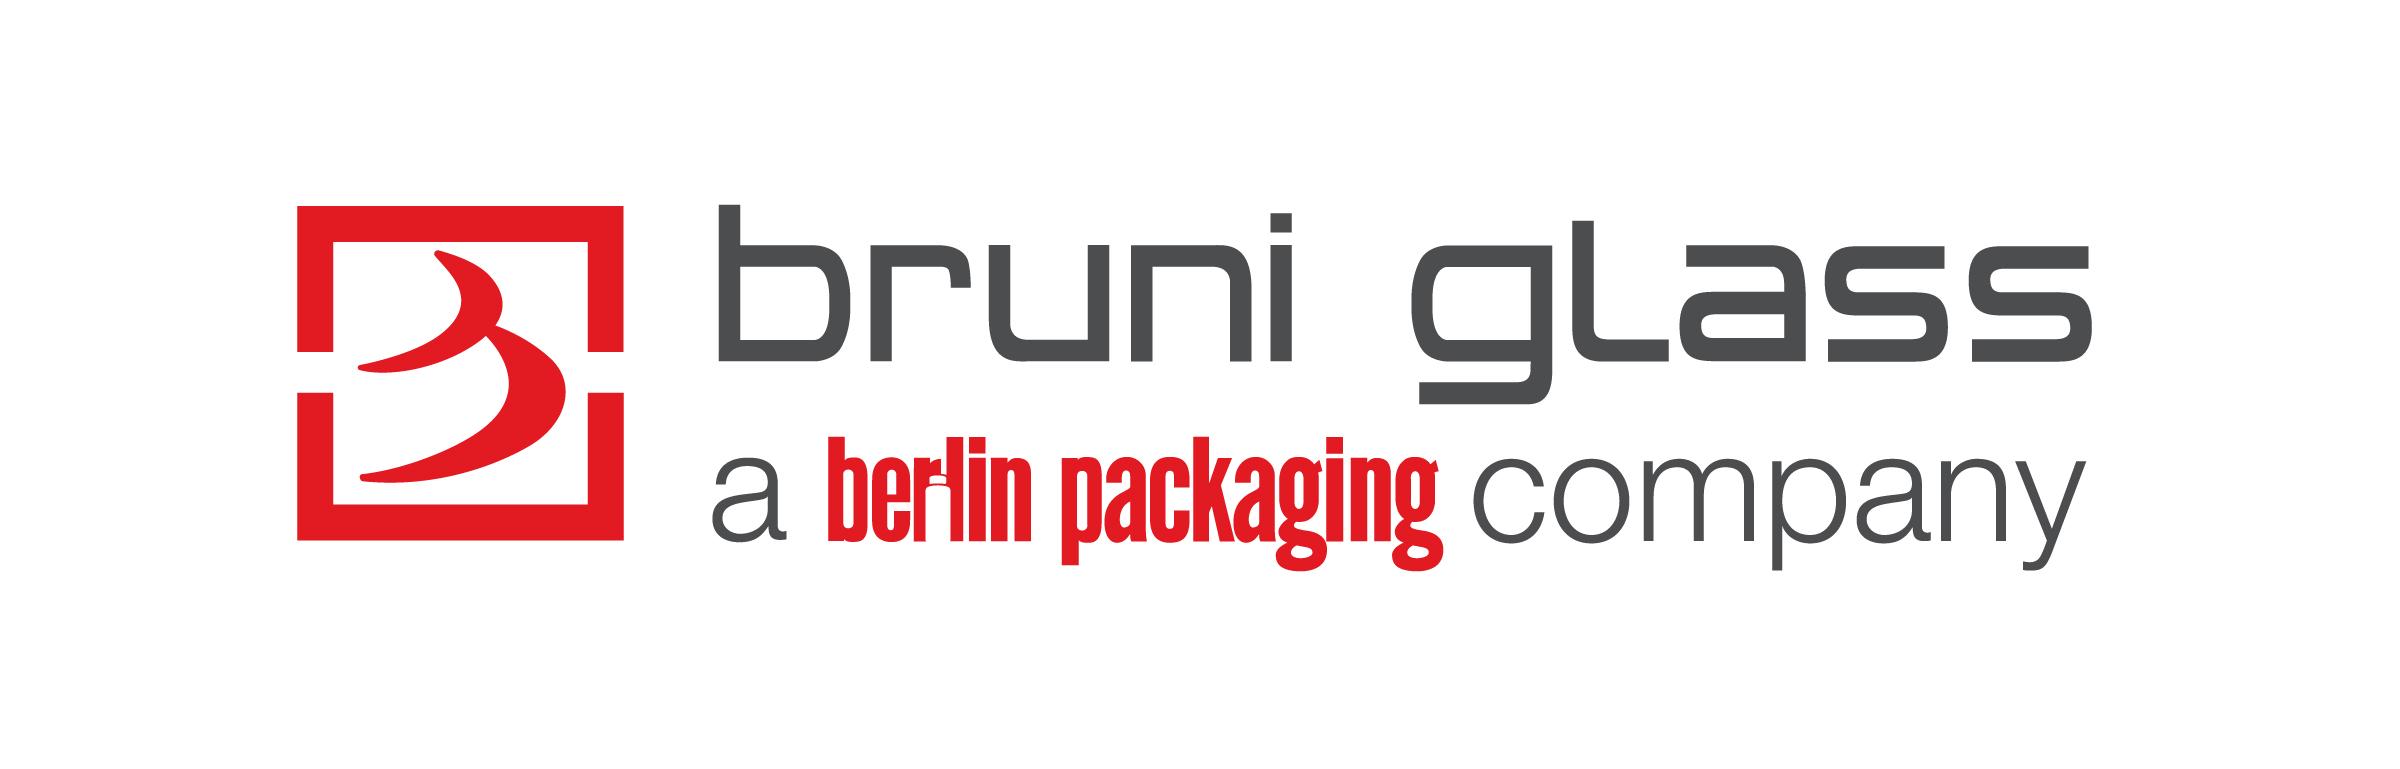 Bruni_Glass_Logo_Horizontal-01.jpg